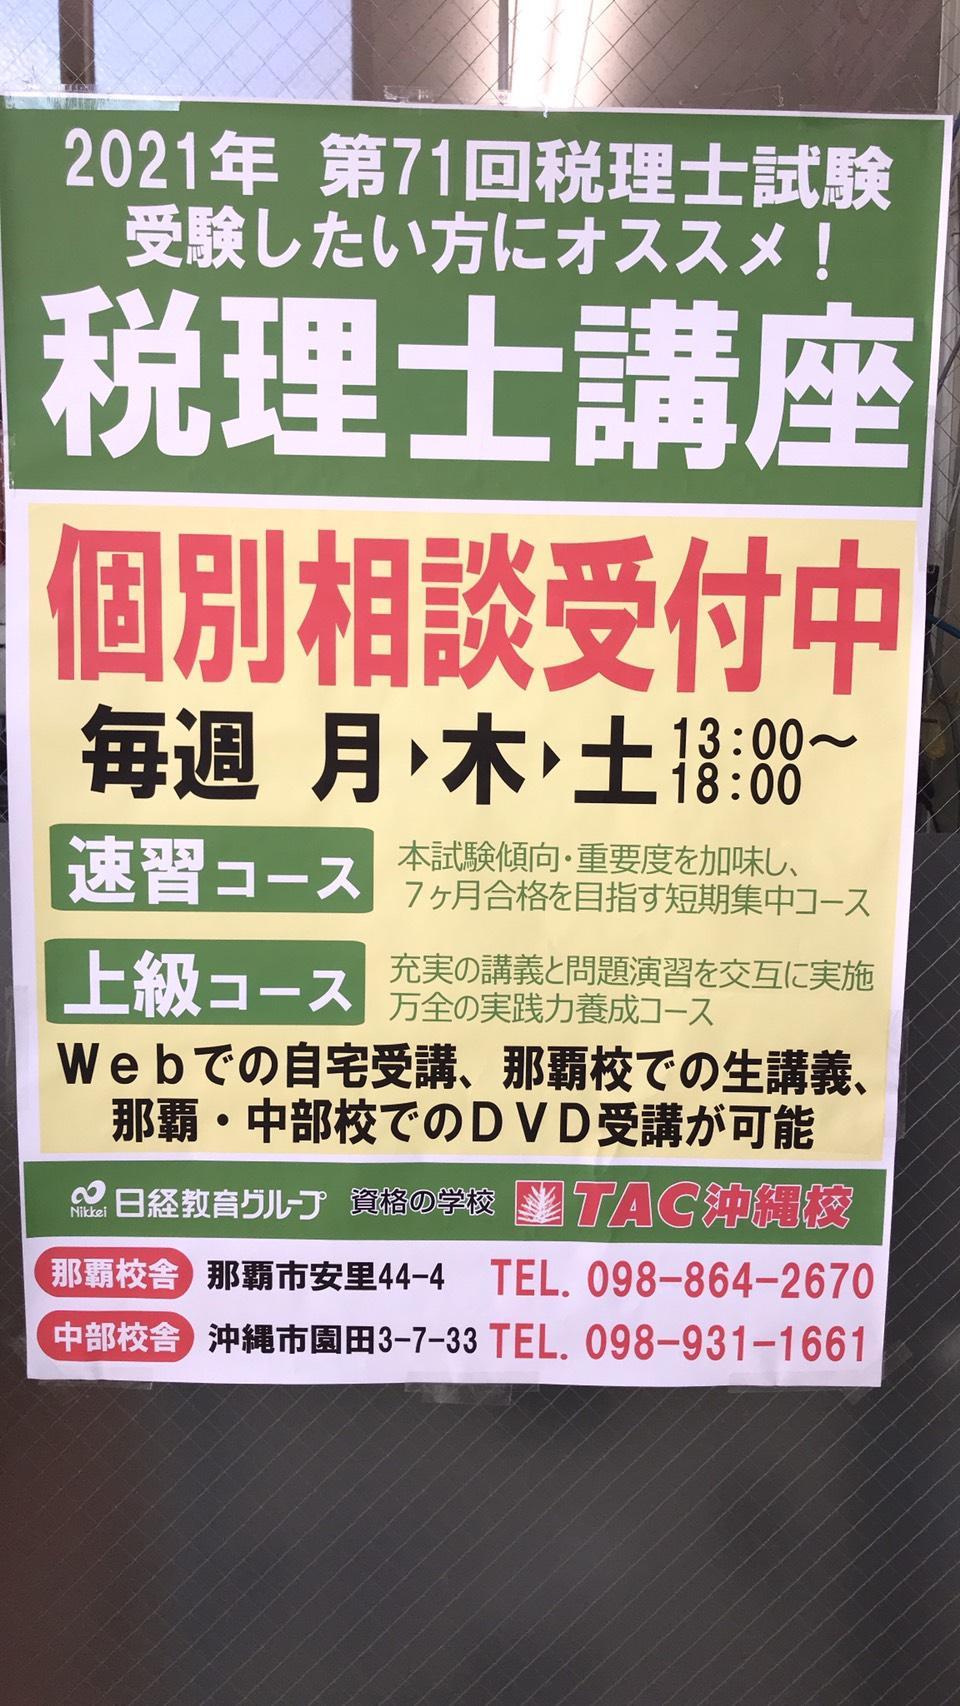 S__14401546.jpg